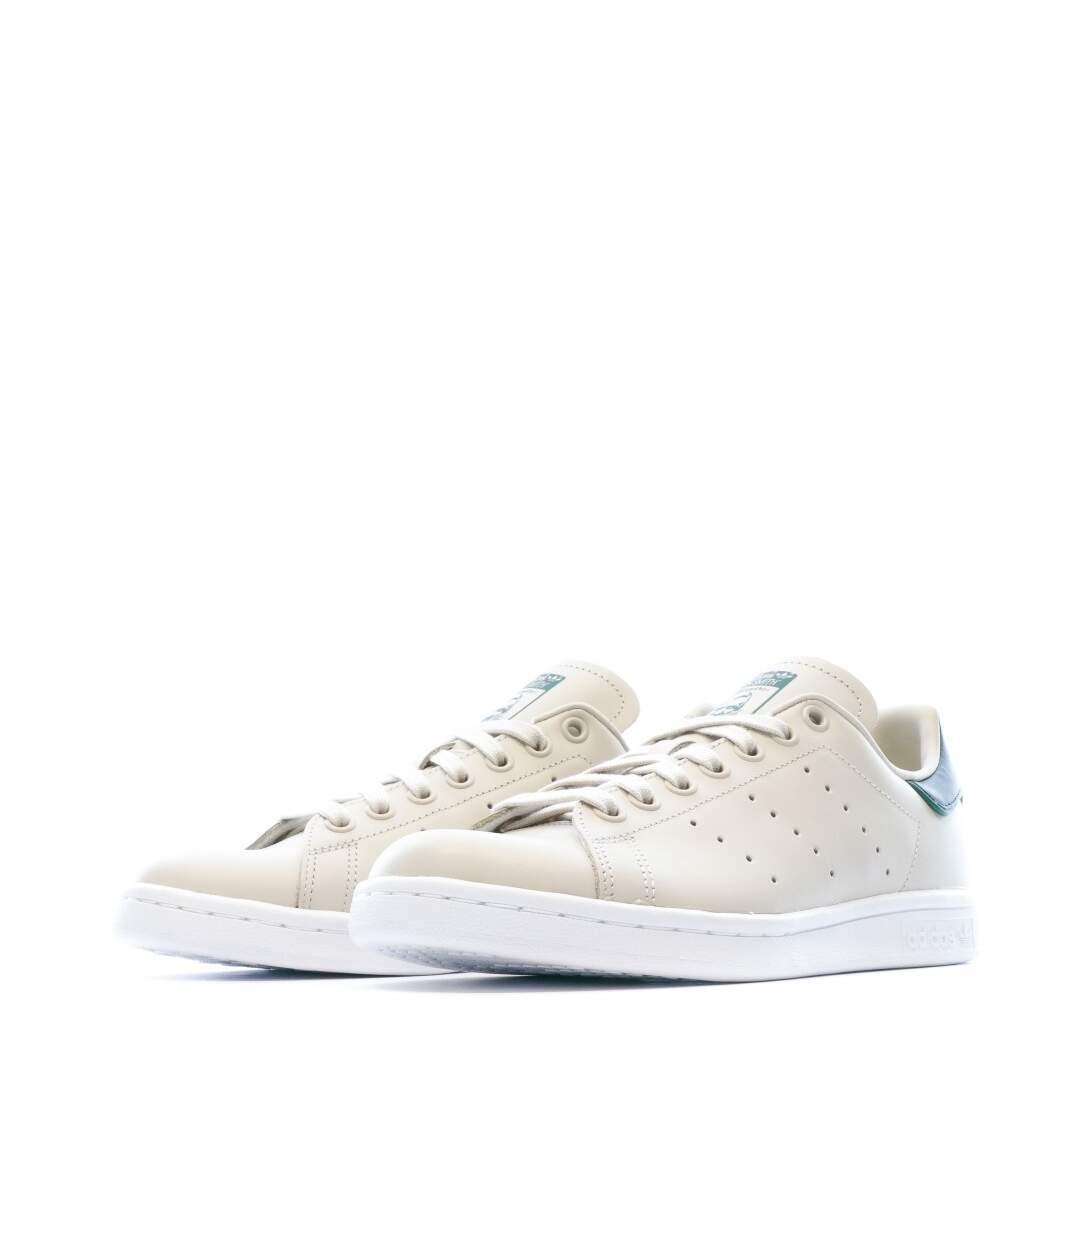 Grande Vente Stan Smith Sneakers Beige Homme Adidas Originals dsf.d455nksdKLFHG